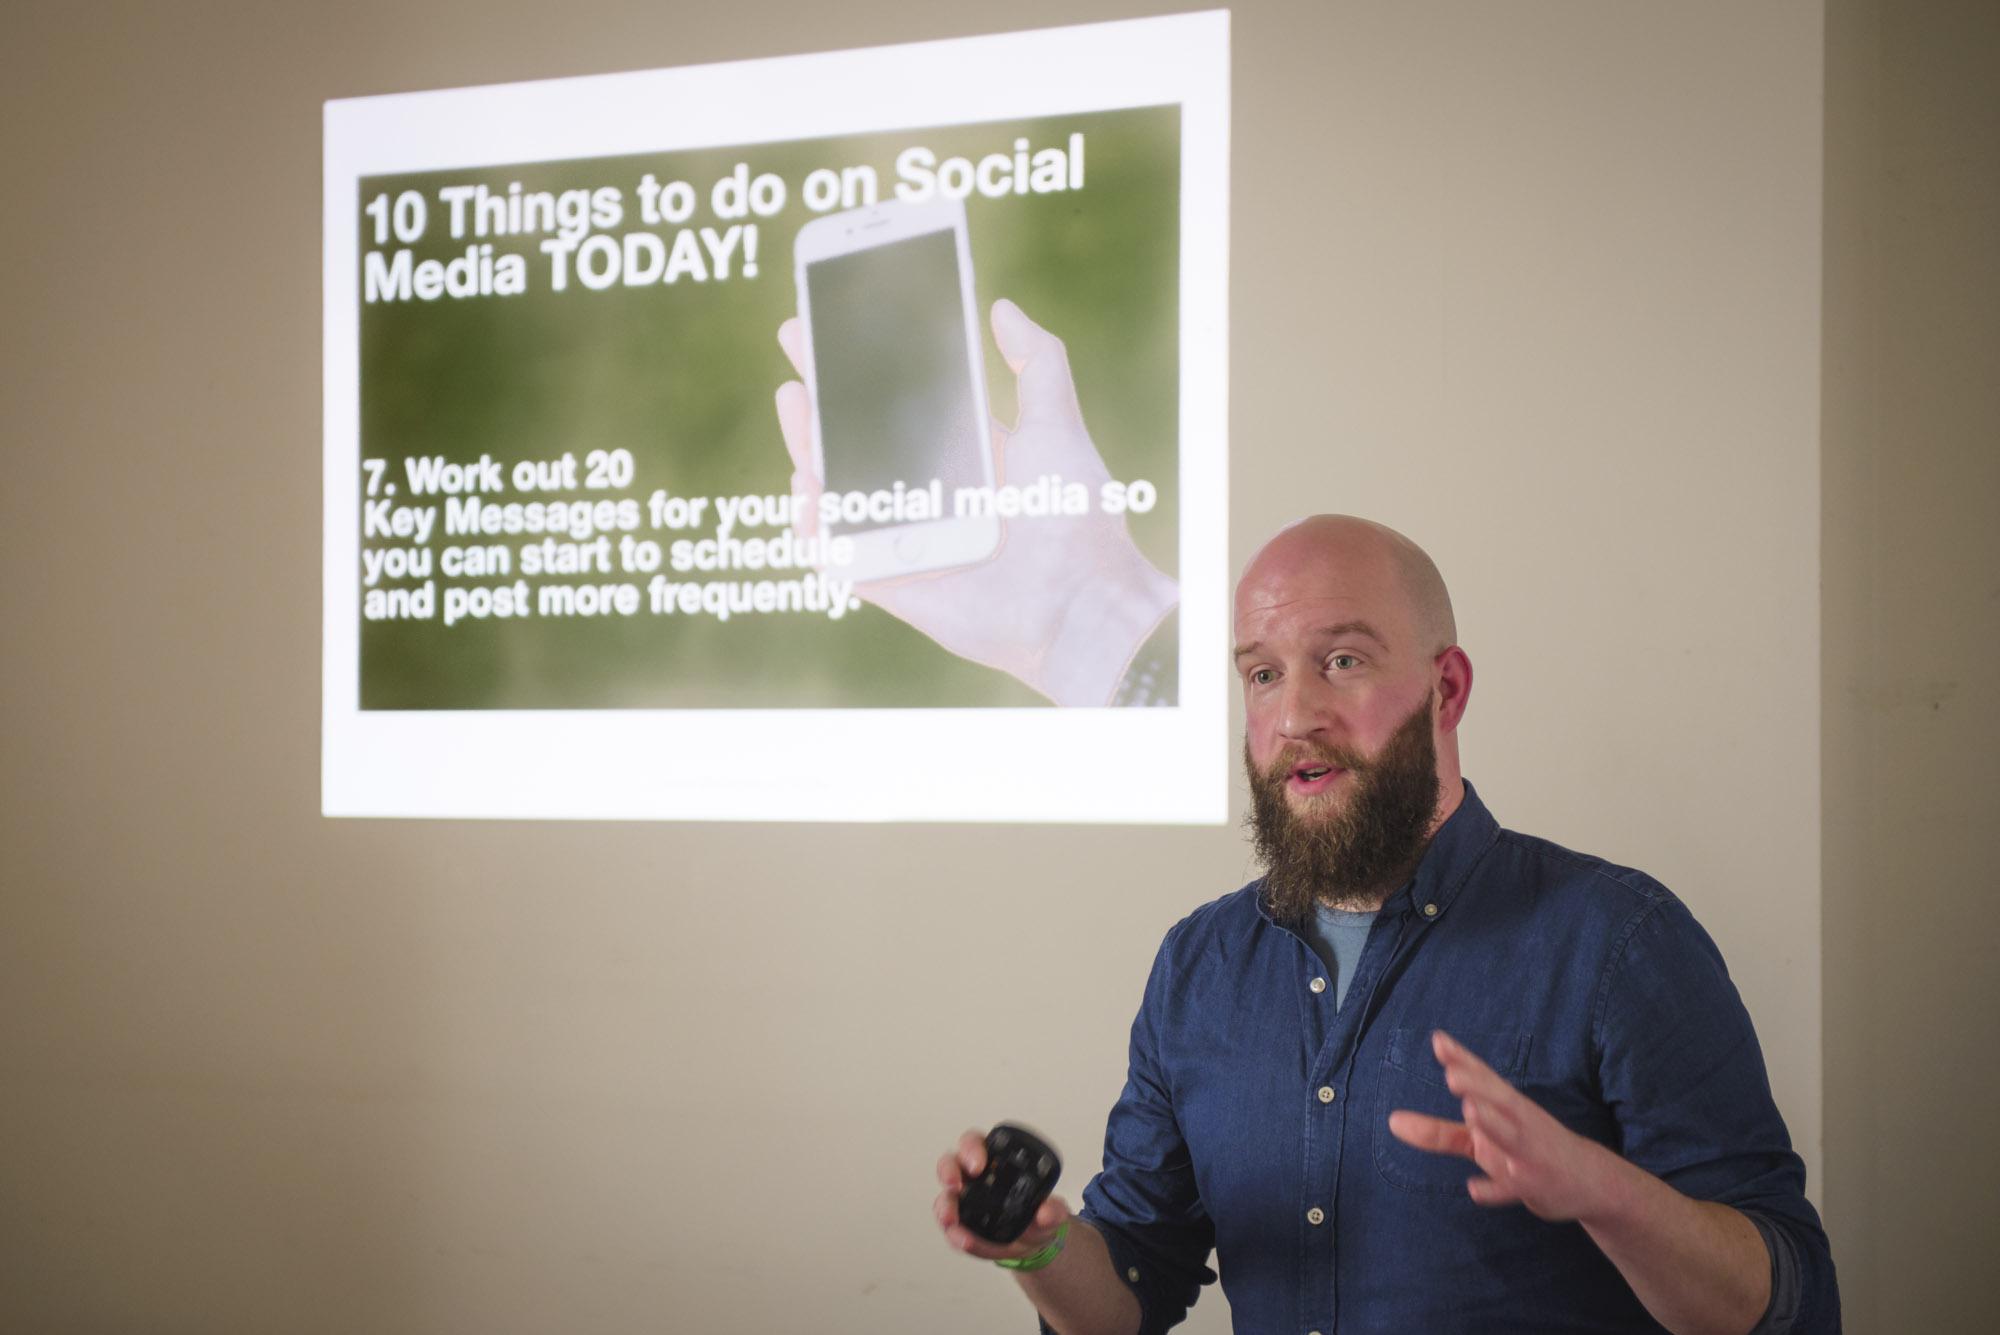 Gary Jones giving a talk on social media at the Leamington Business Show 2018